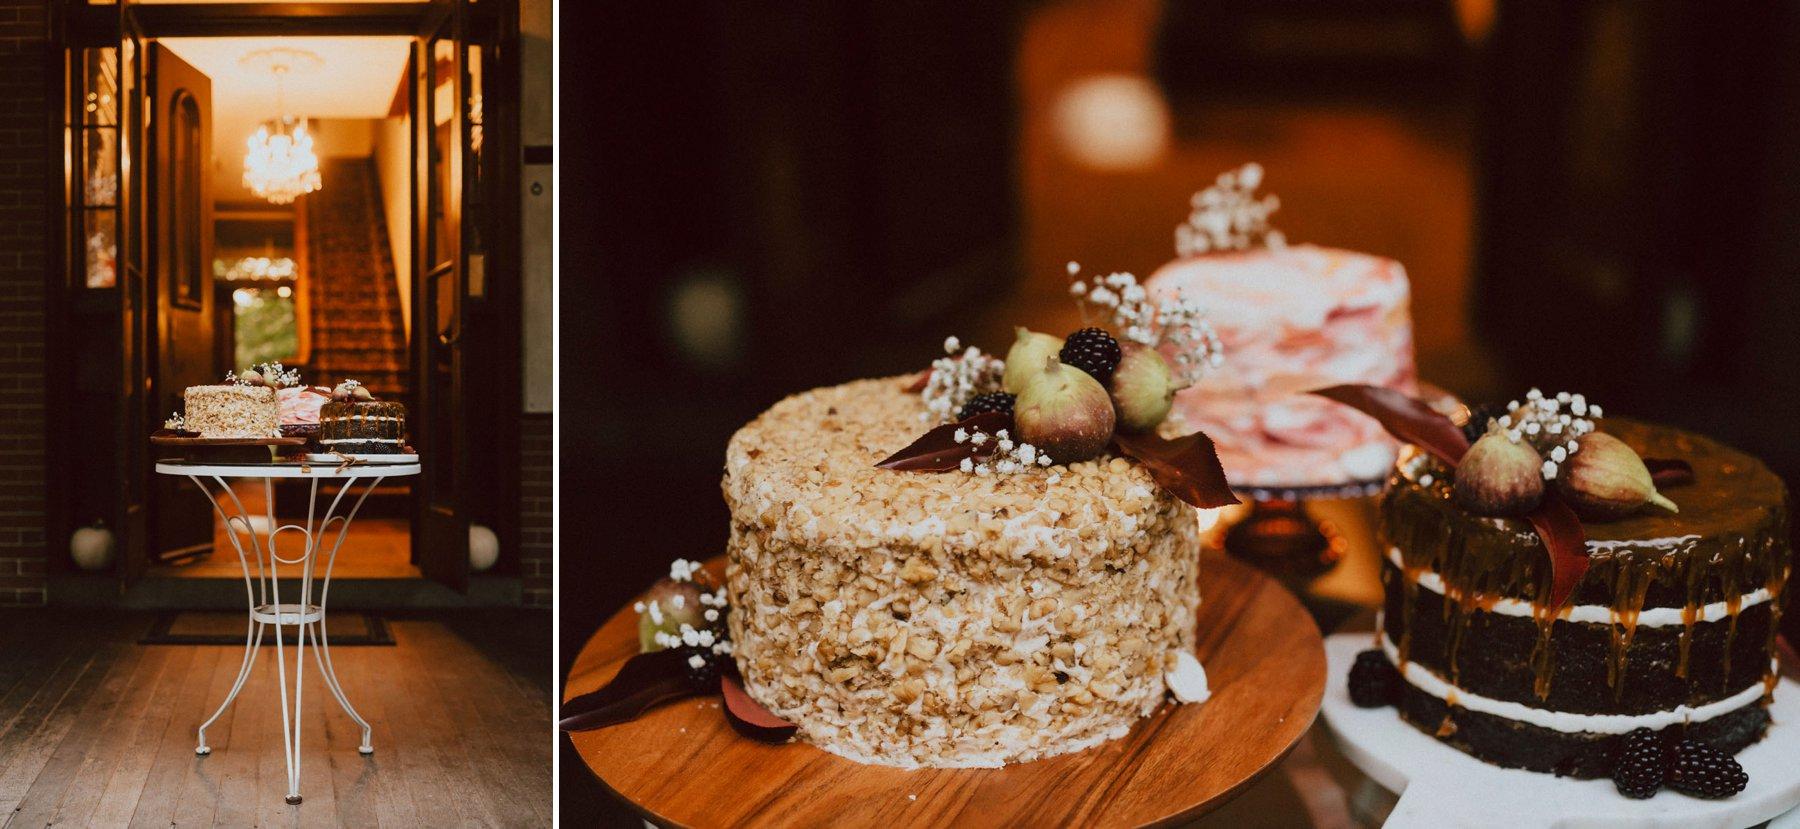 faunbrook-bed-and-breakfast-wedding-128.jpg